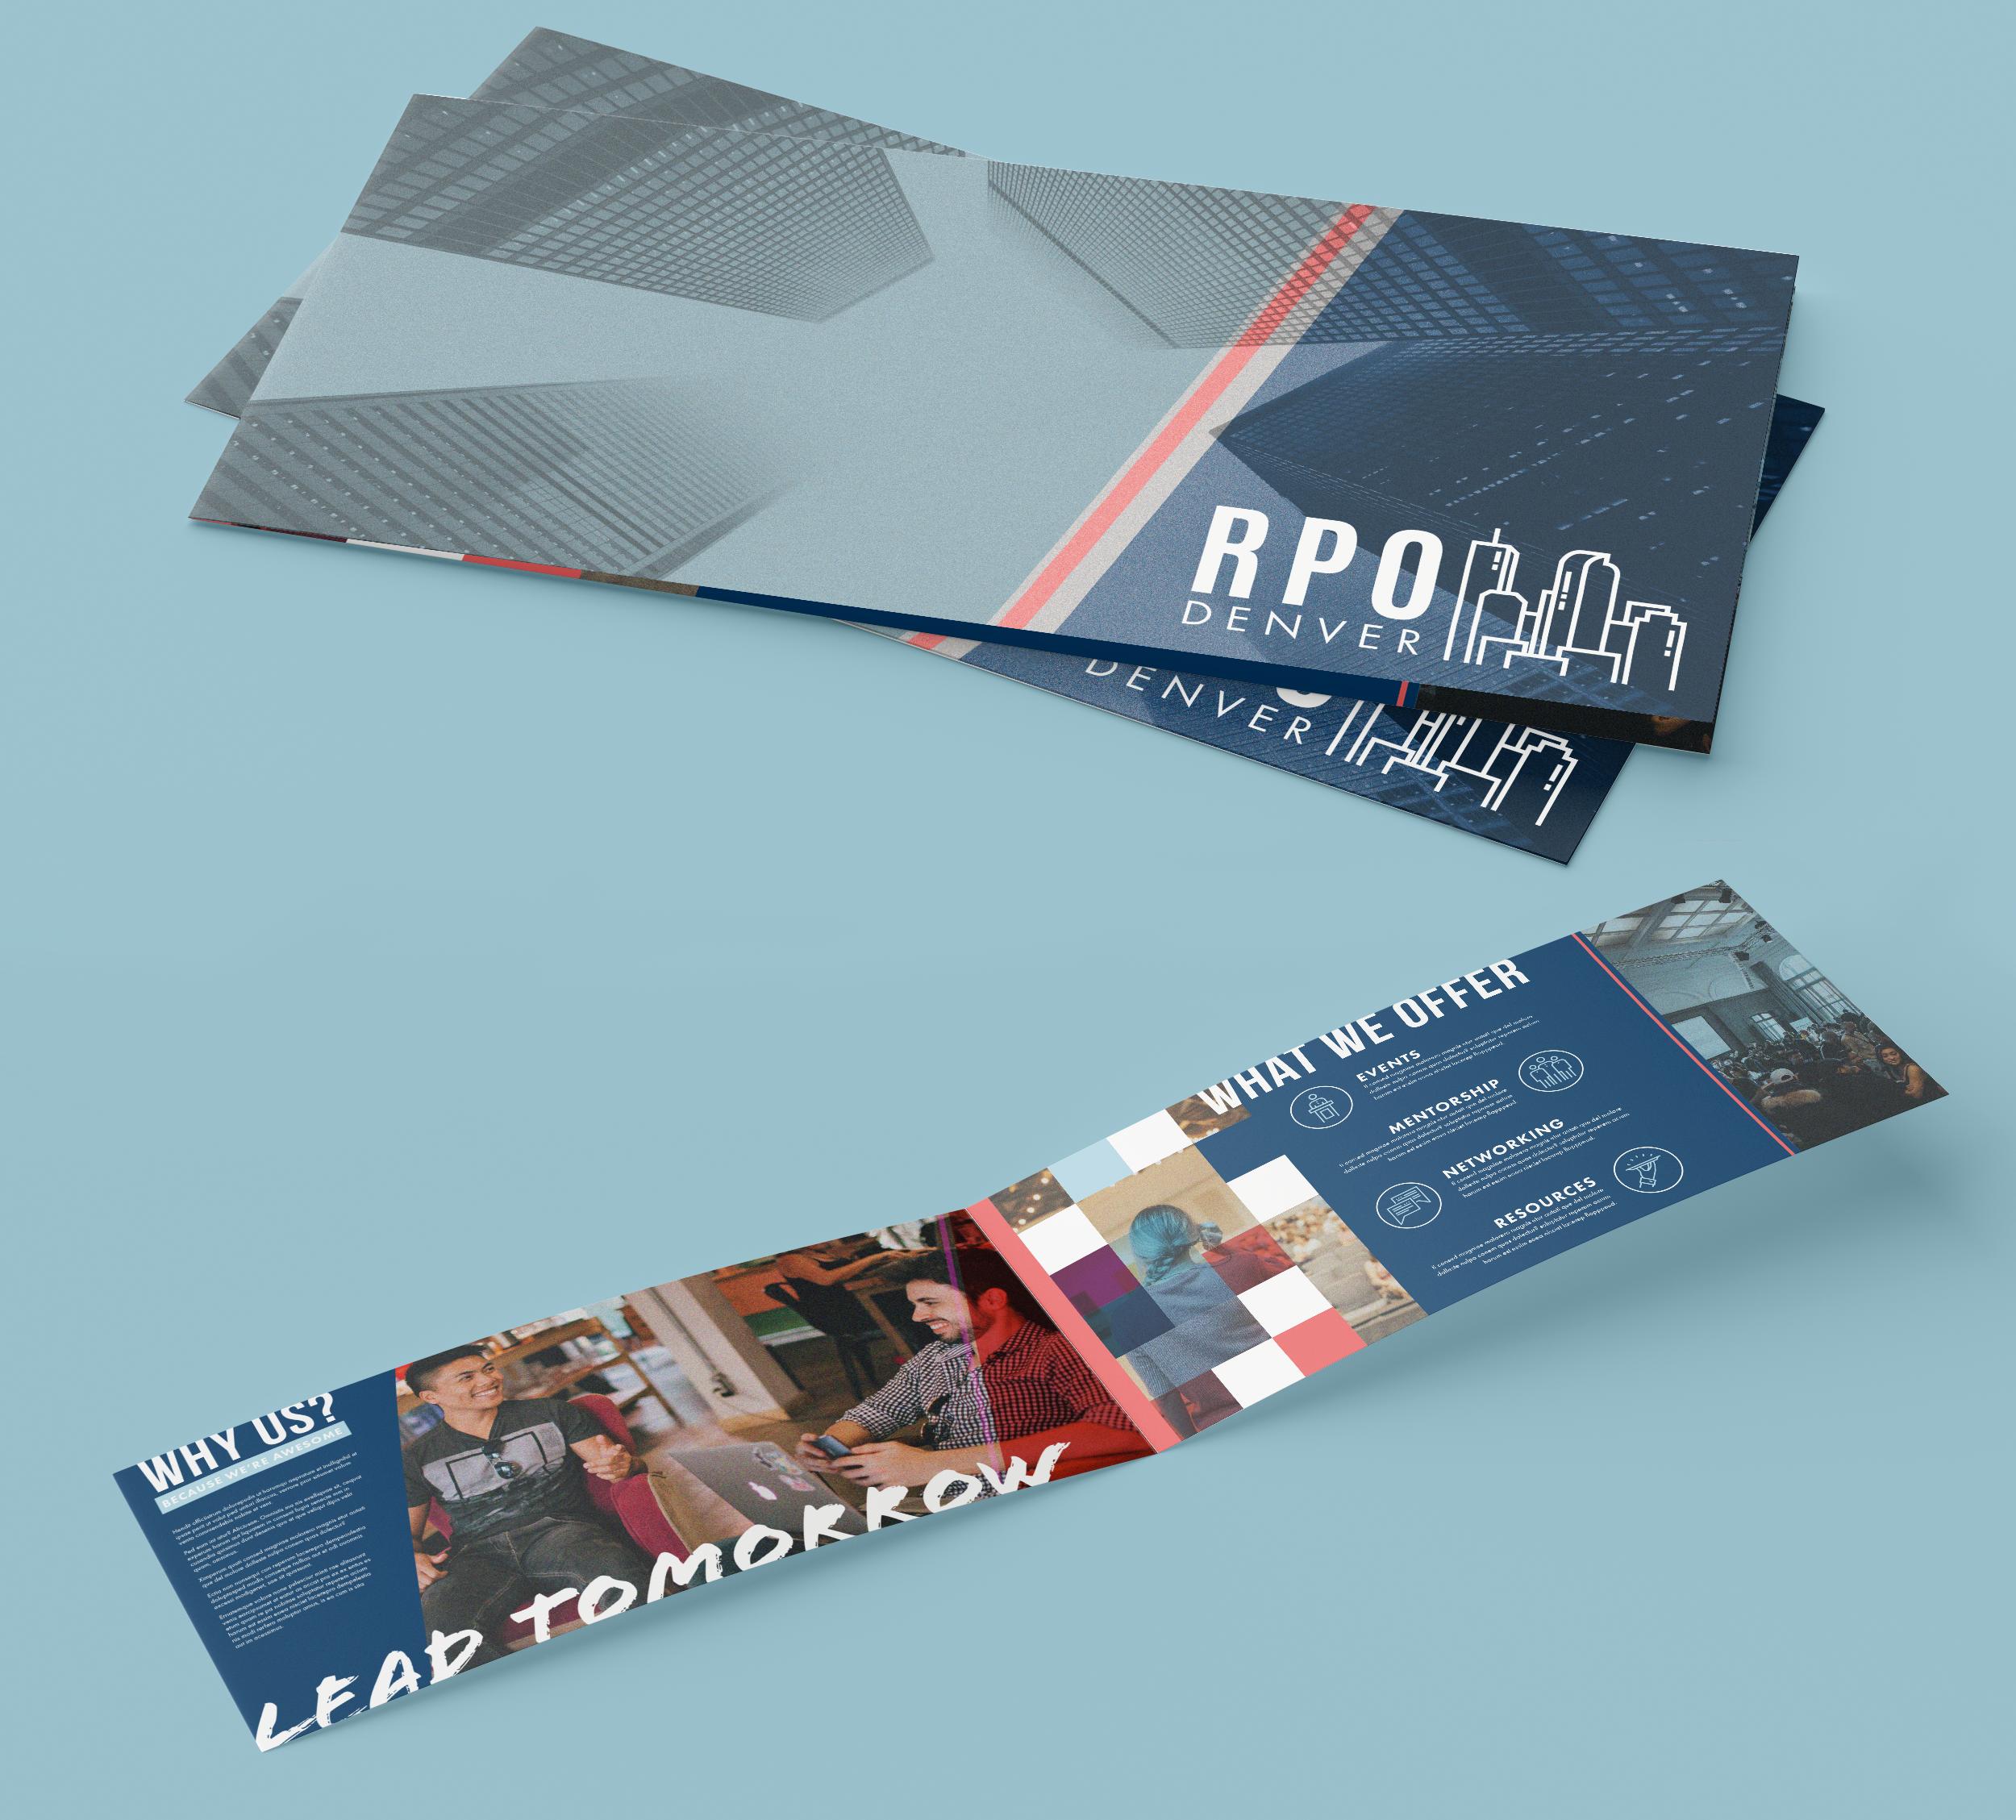 RPO-Brochure-03.png